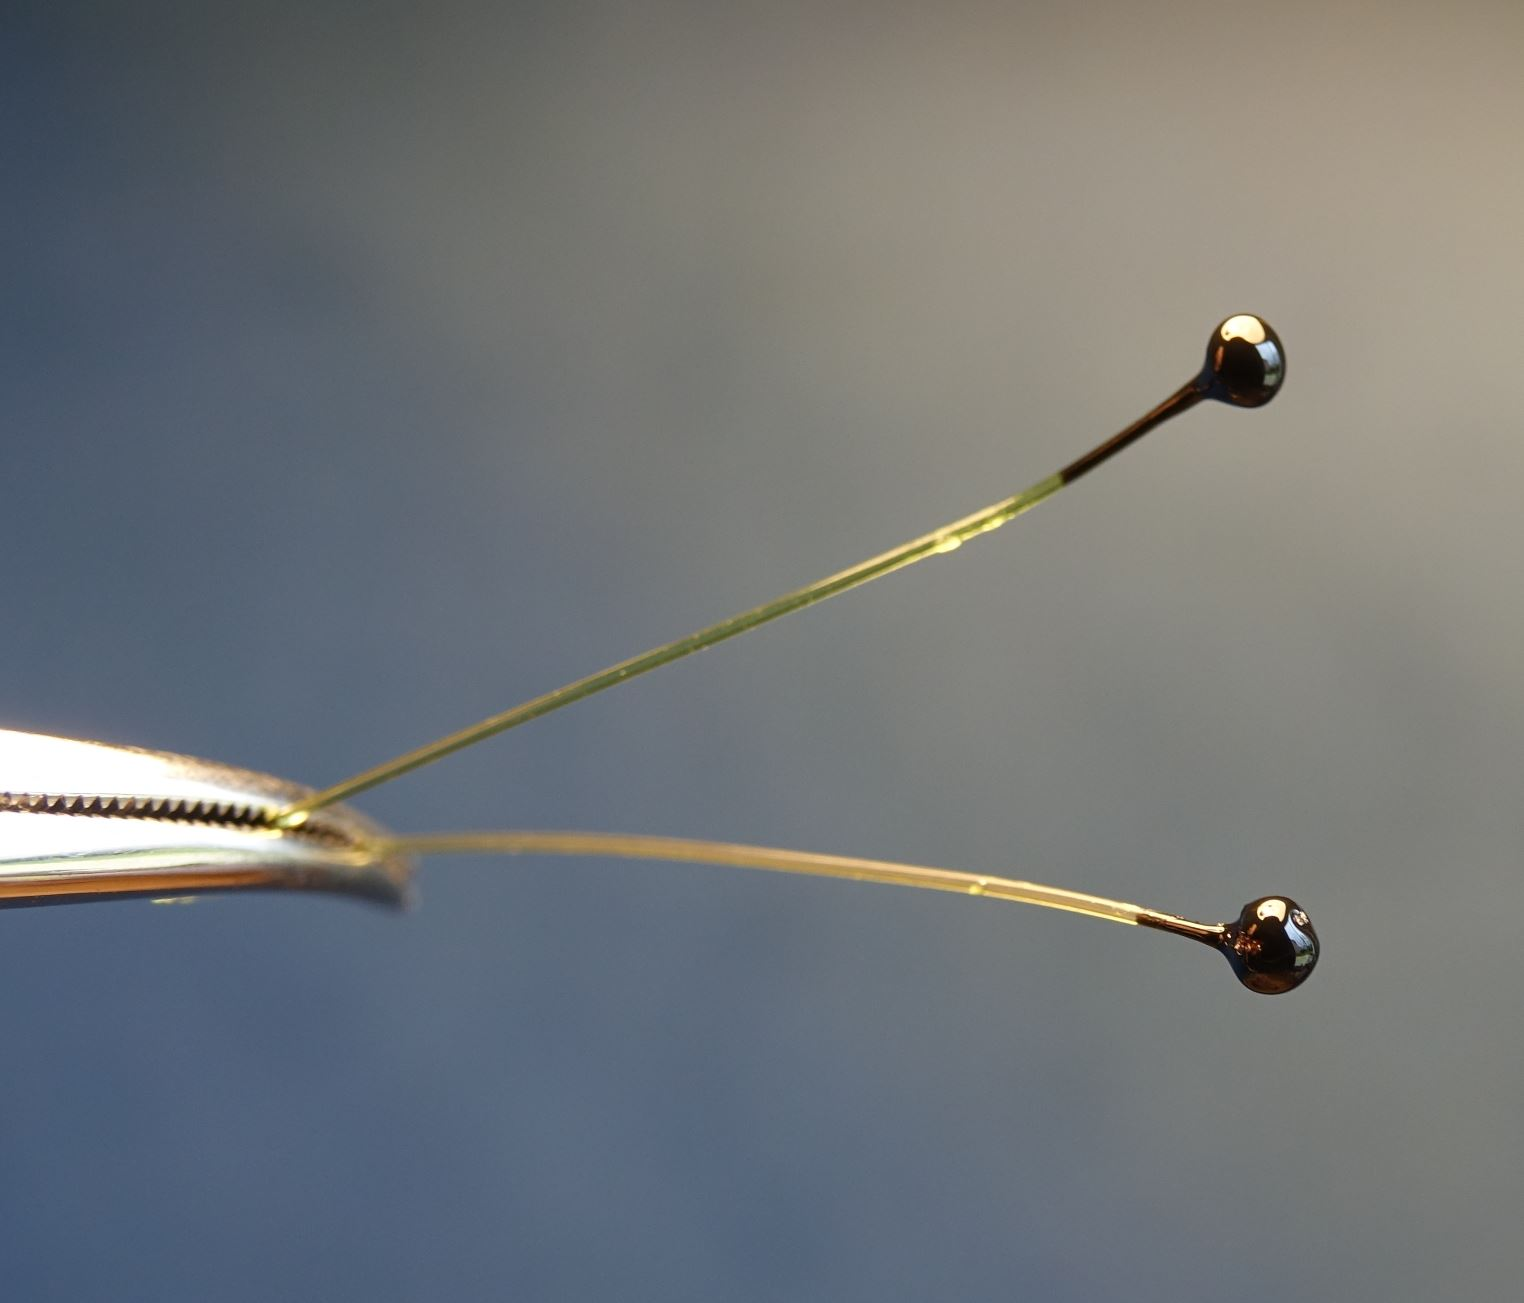 Ecrevisse craw crayfish fly tying mouche eclosion oeil eye